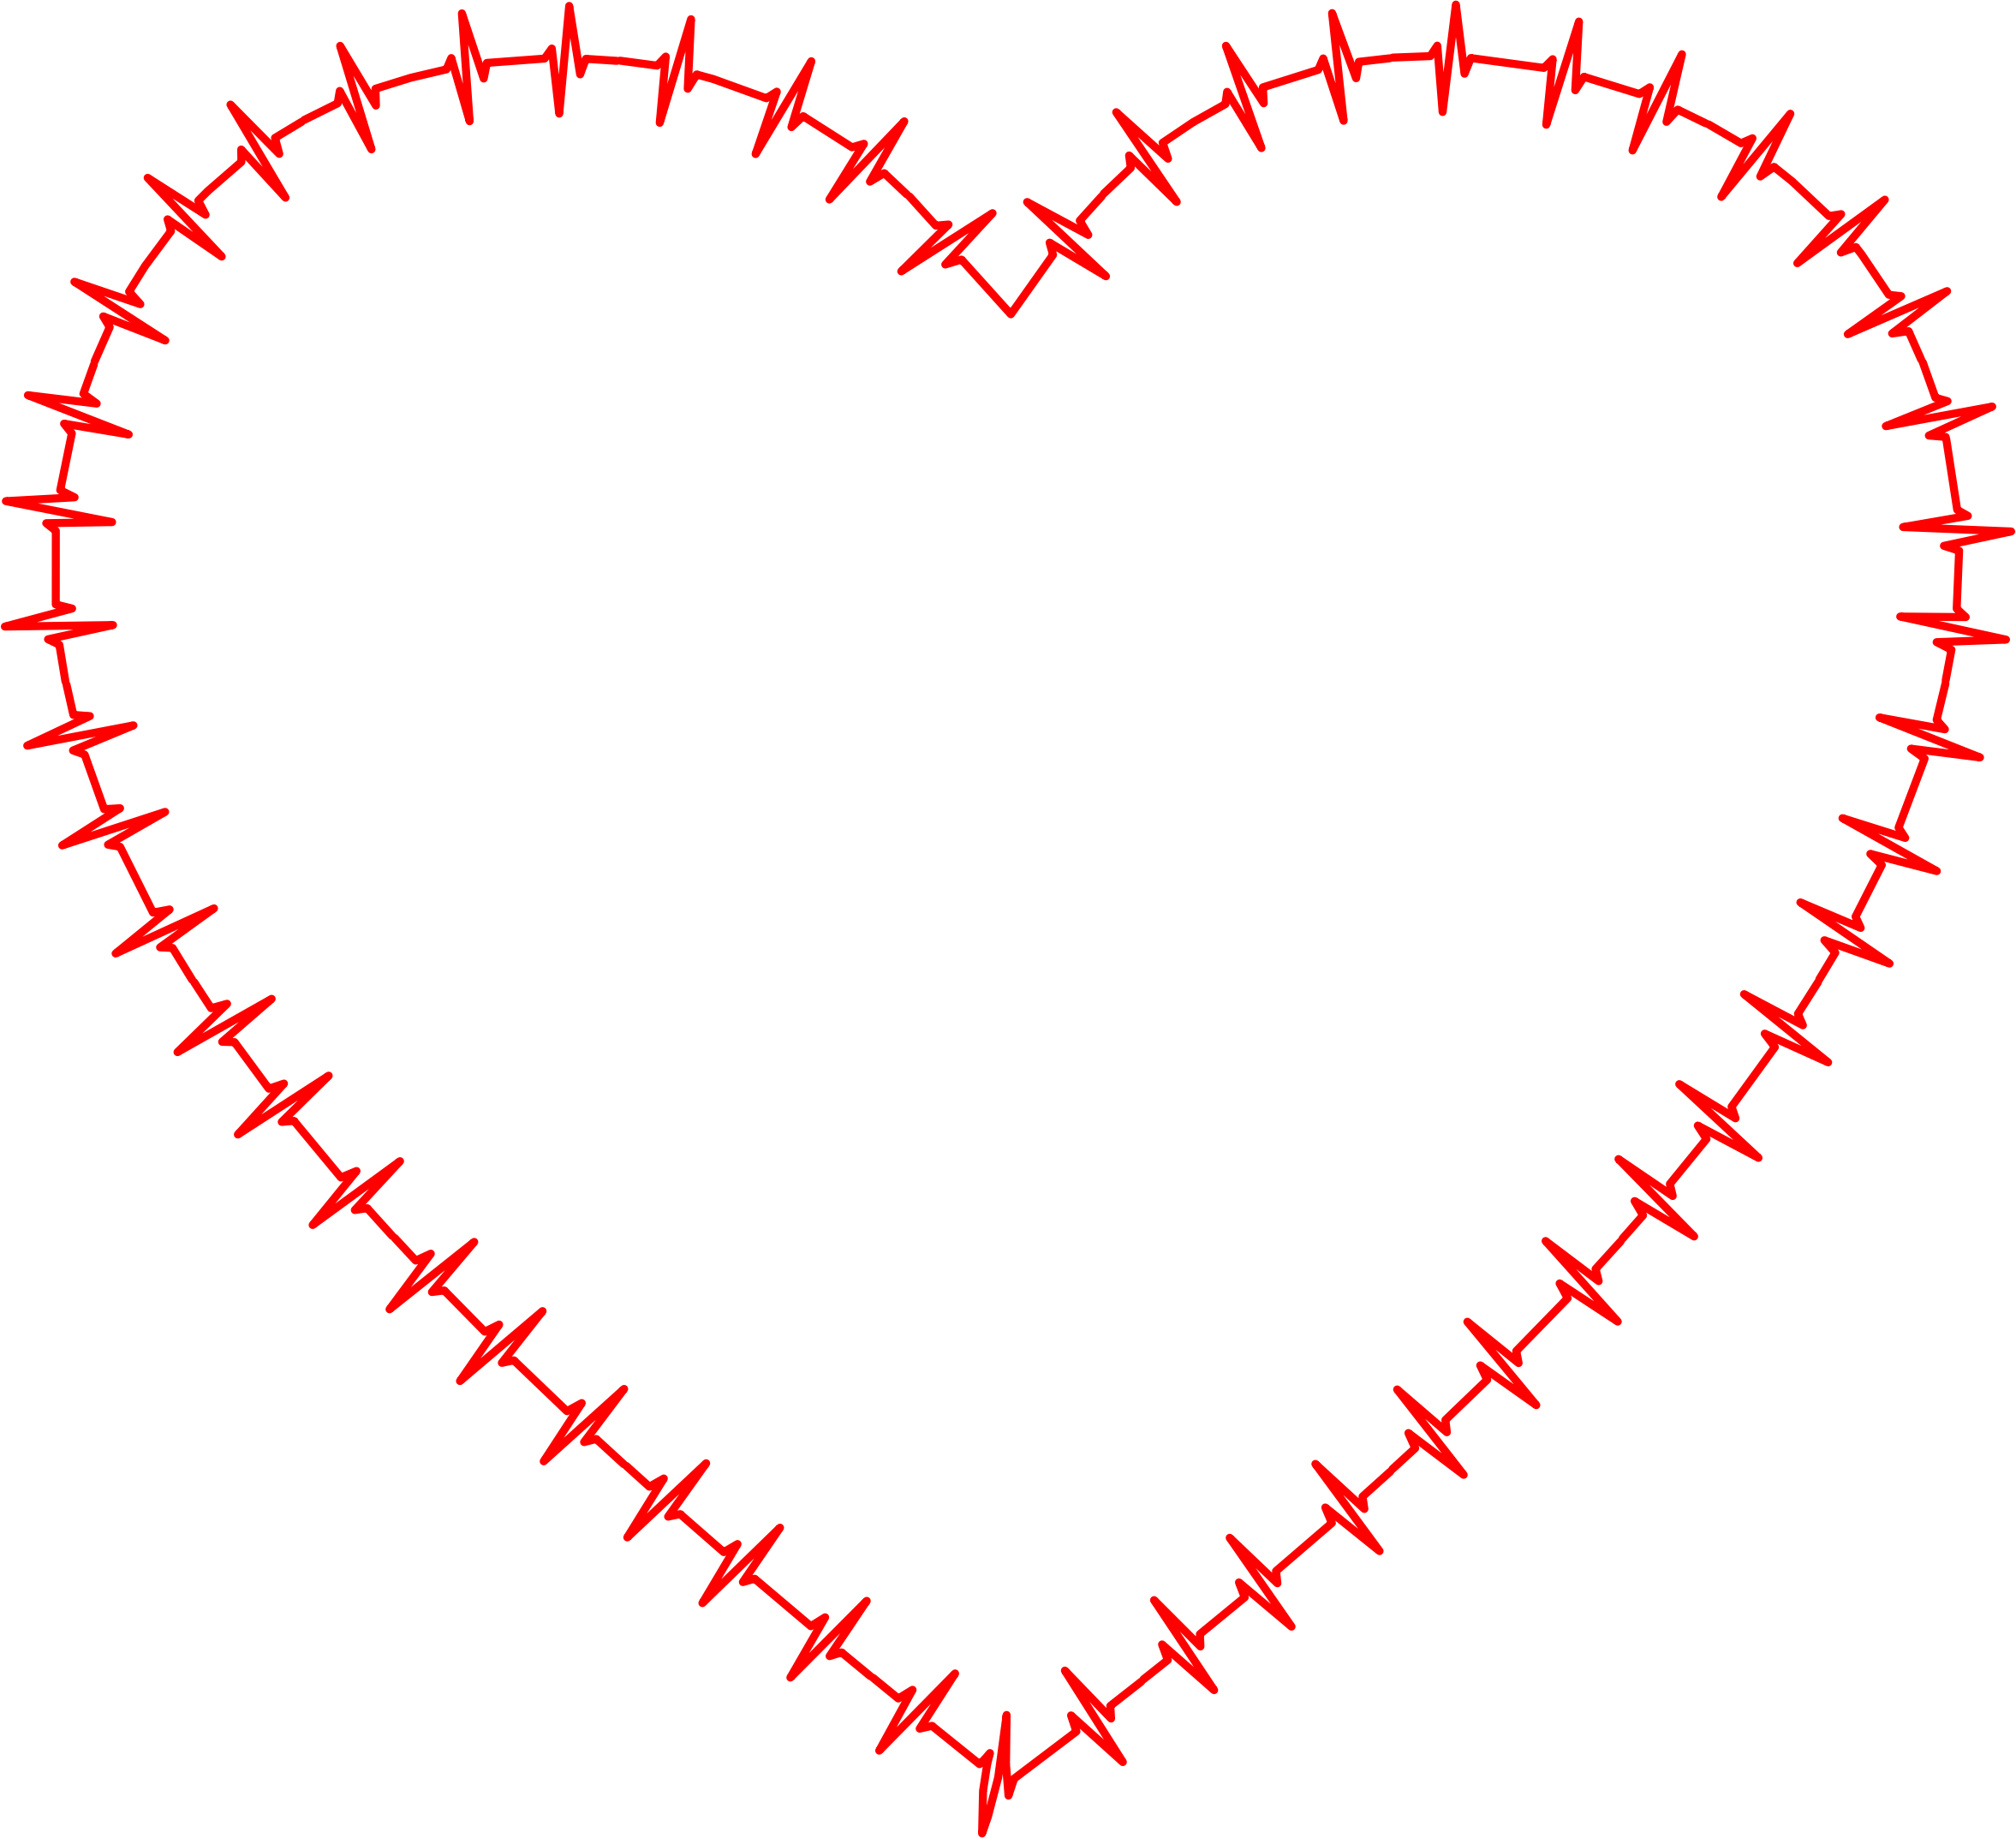 Rhythm thick icons png. Ekg clipart heart shaped